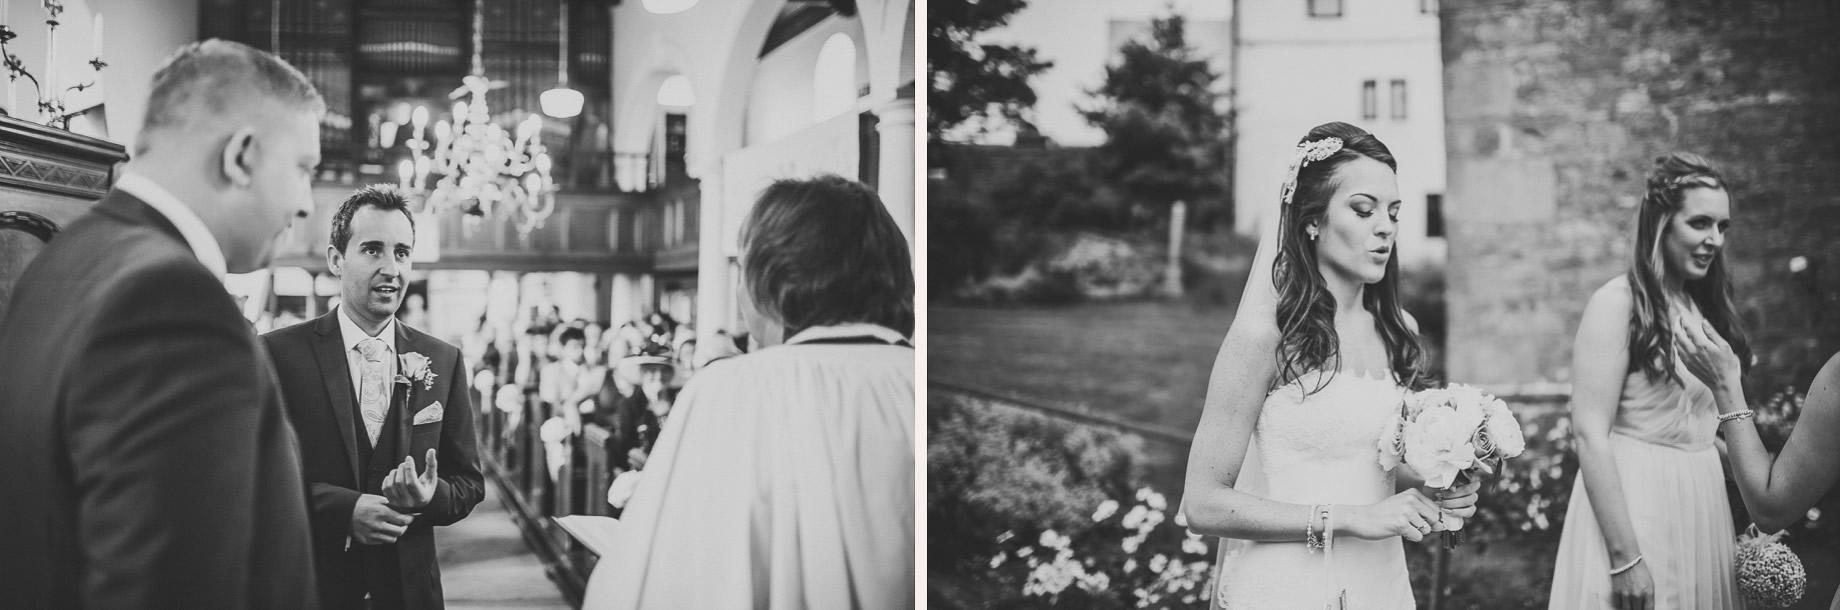 Helen and Matt's Wedding at Mitton Hall 036